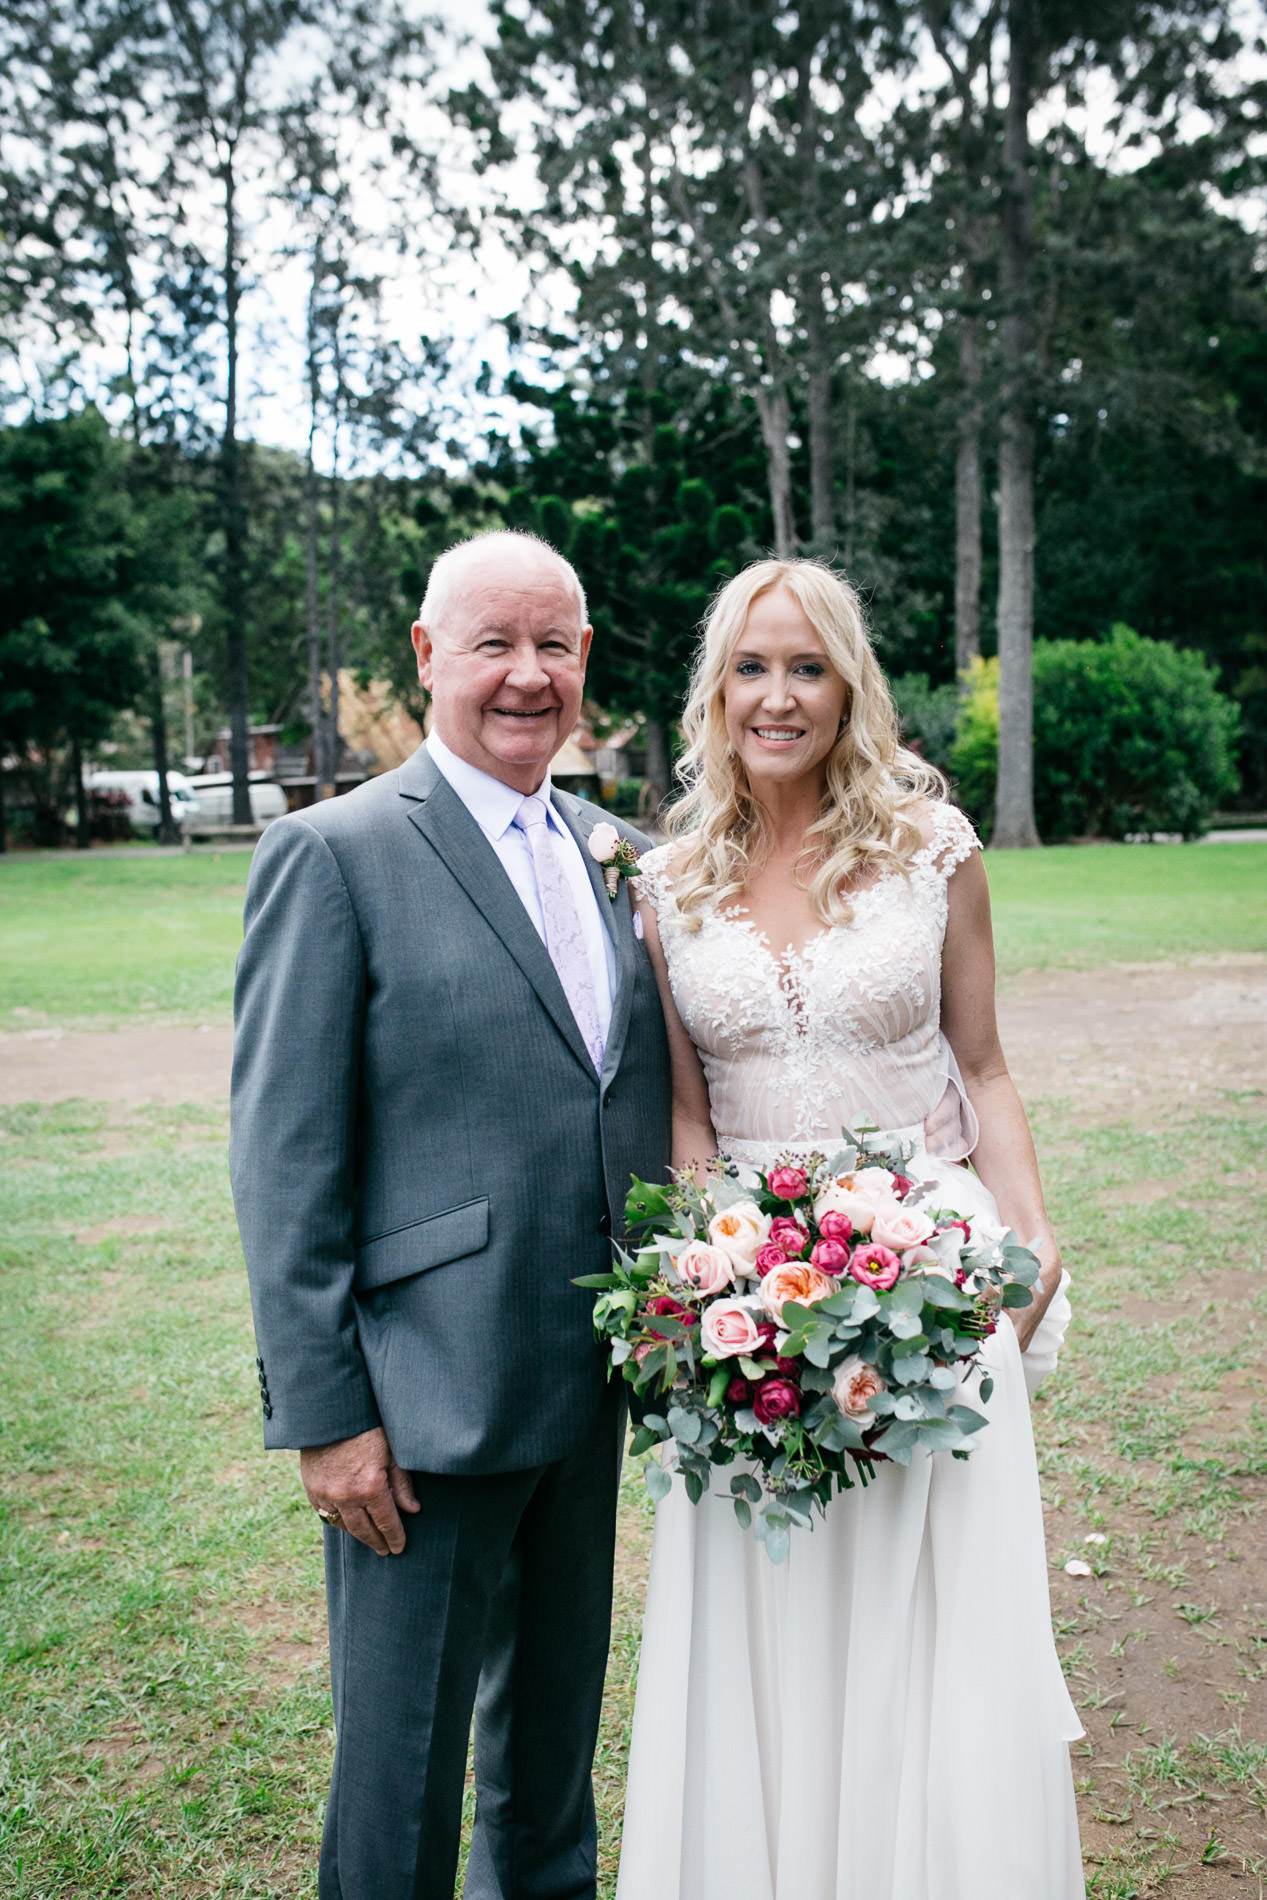 True North Photography_Boomerang Farm_Stacey and Isaac_Gold Coast Wedding_Barm Wedding_Hinterland Wedding-68.jpg